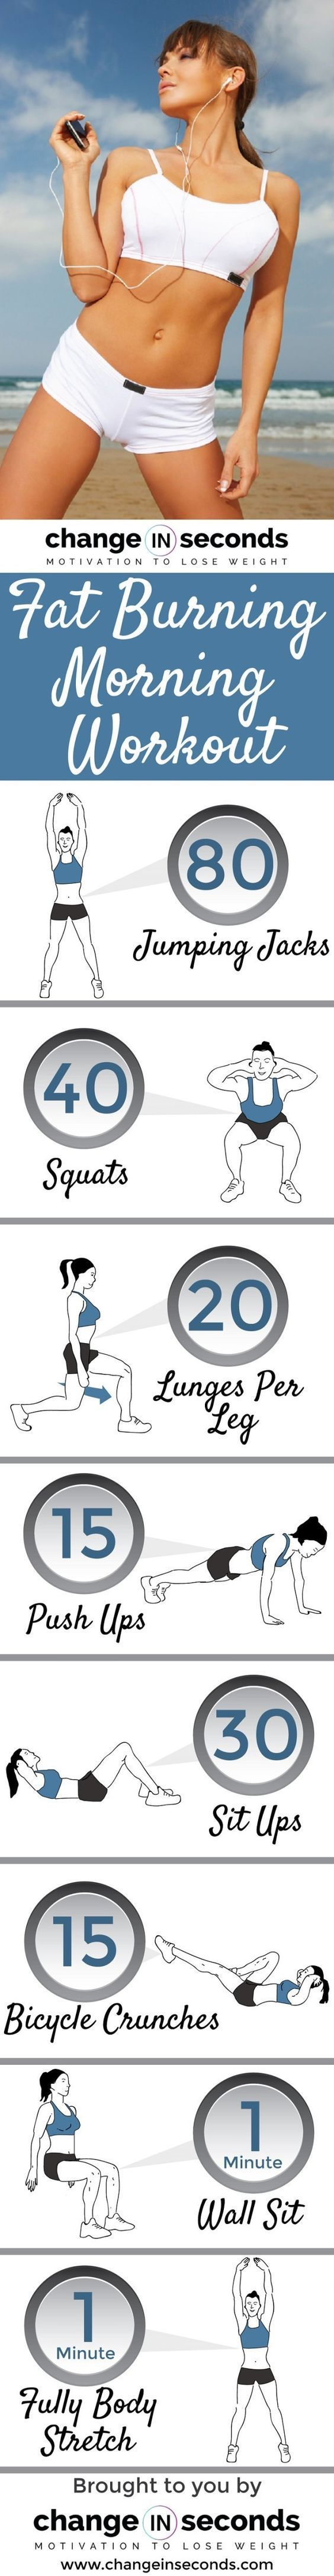 Fat Burning Morning WorkoutFat Burning Morning Workout burn belly fat fast running